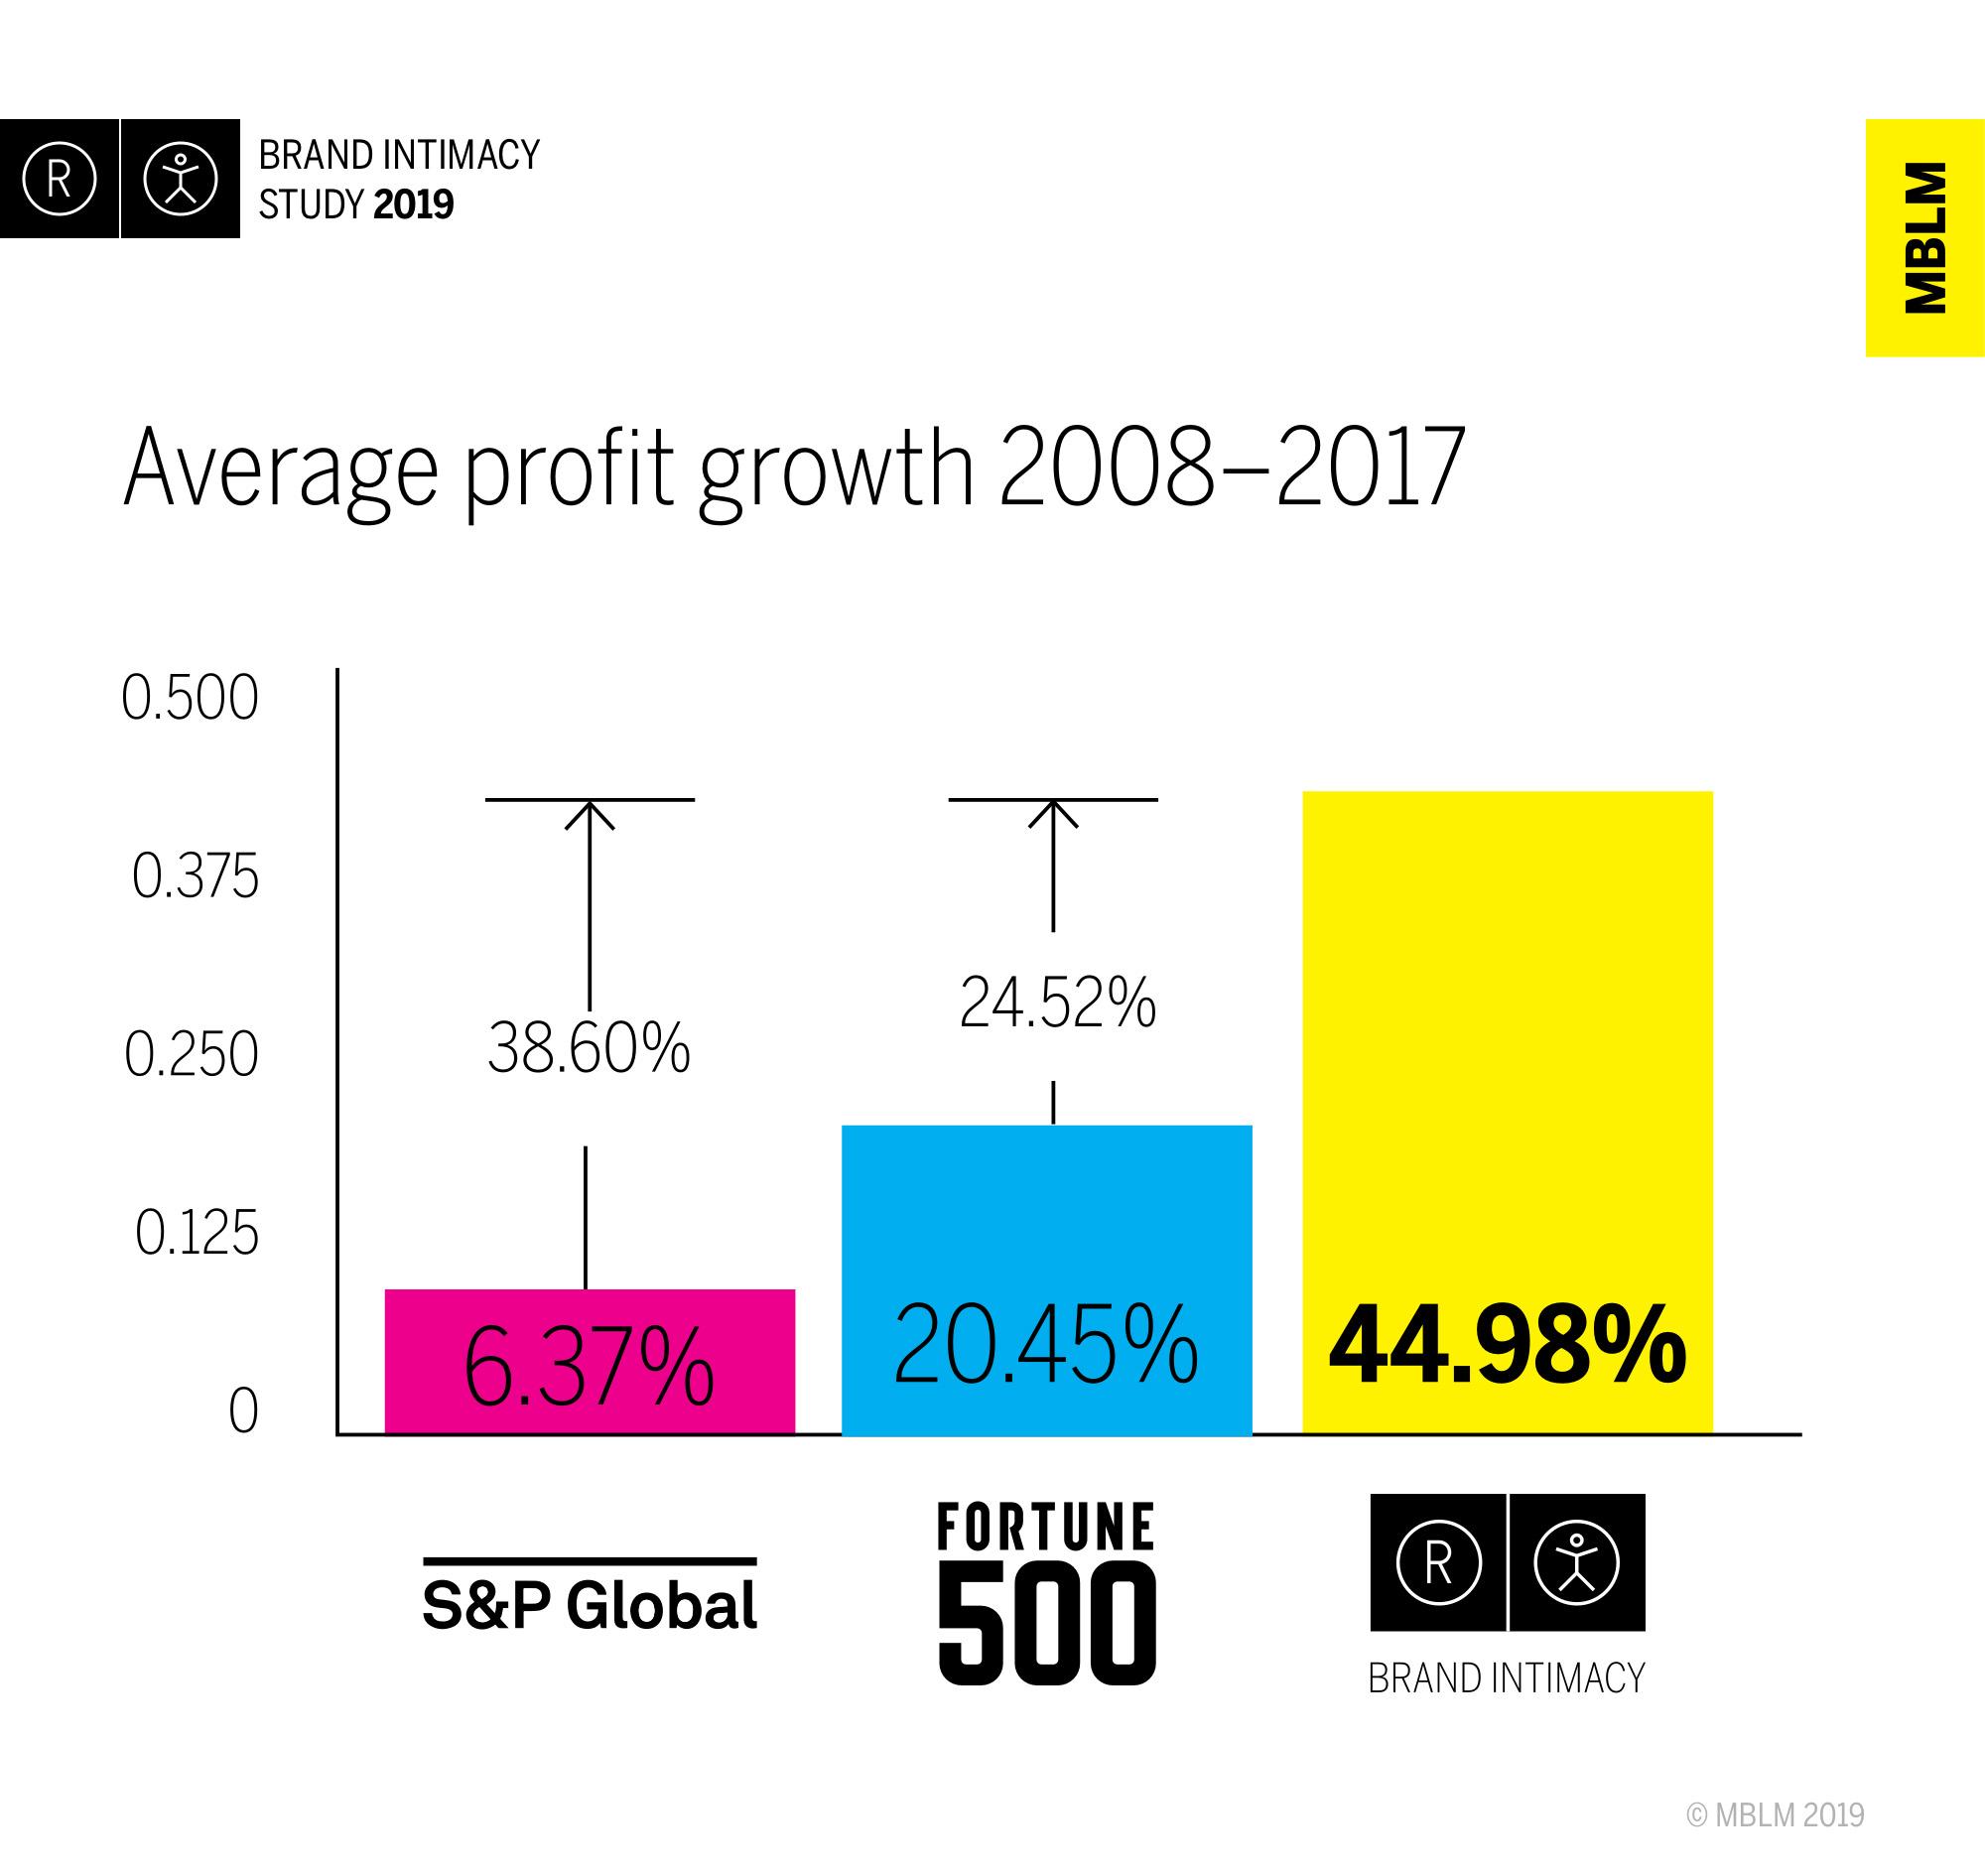 Average Profit Growth 2008-2017